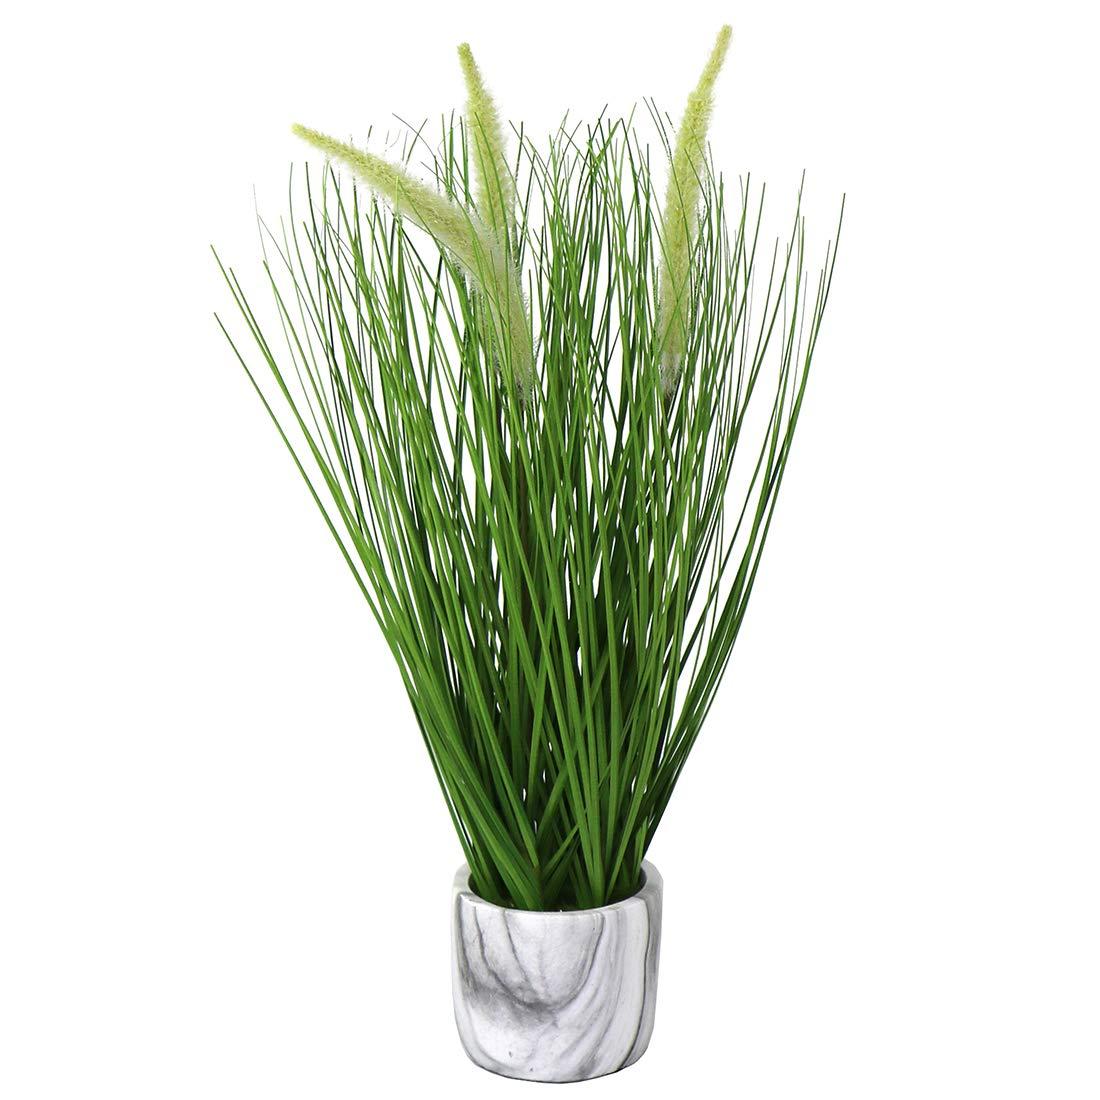 Artificial Mini Plants Flowers Fake Outdoor Plants Faux Greenery Artificial Grass Flower in White Pot Arrangements Garden Office Patio Indoor Outside Home Decor (White/Pot)